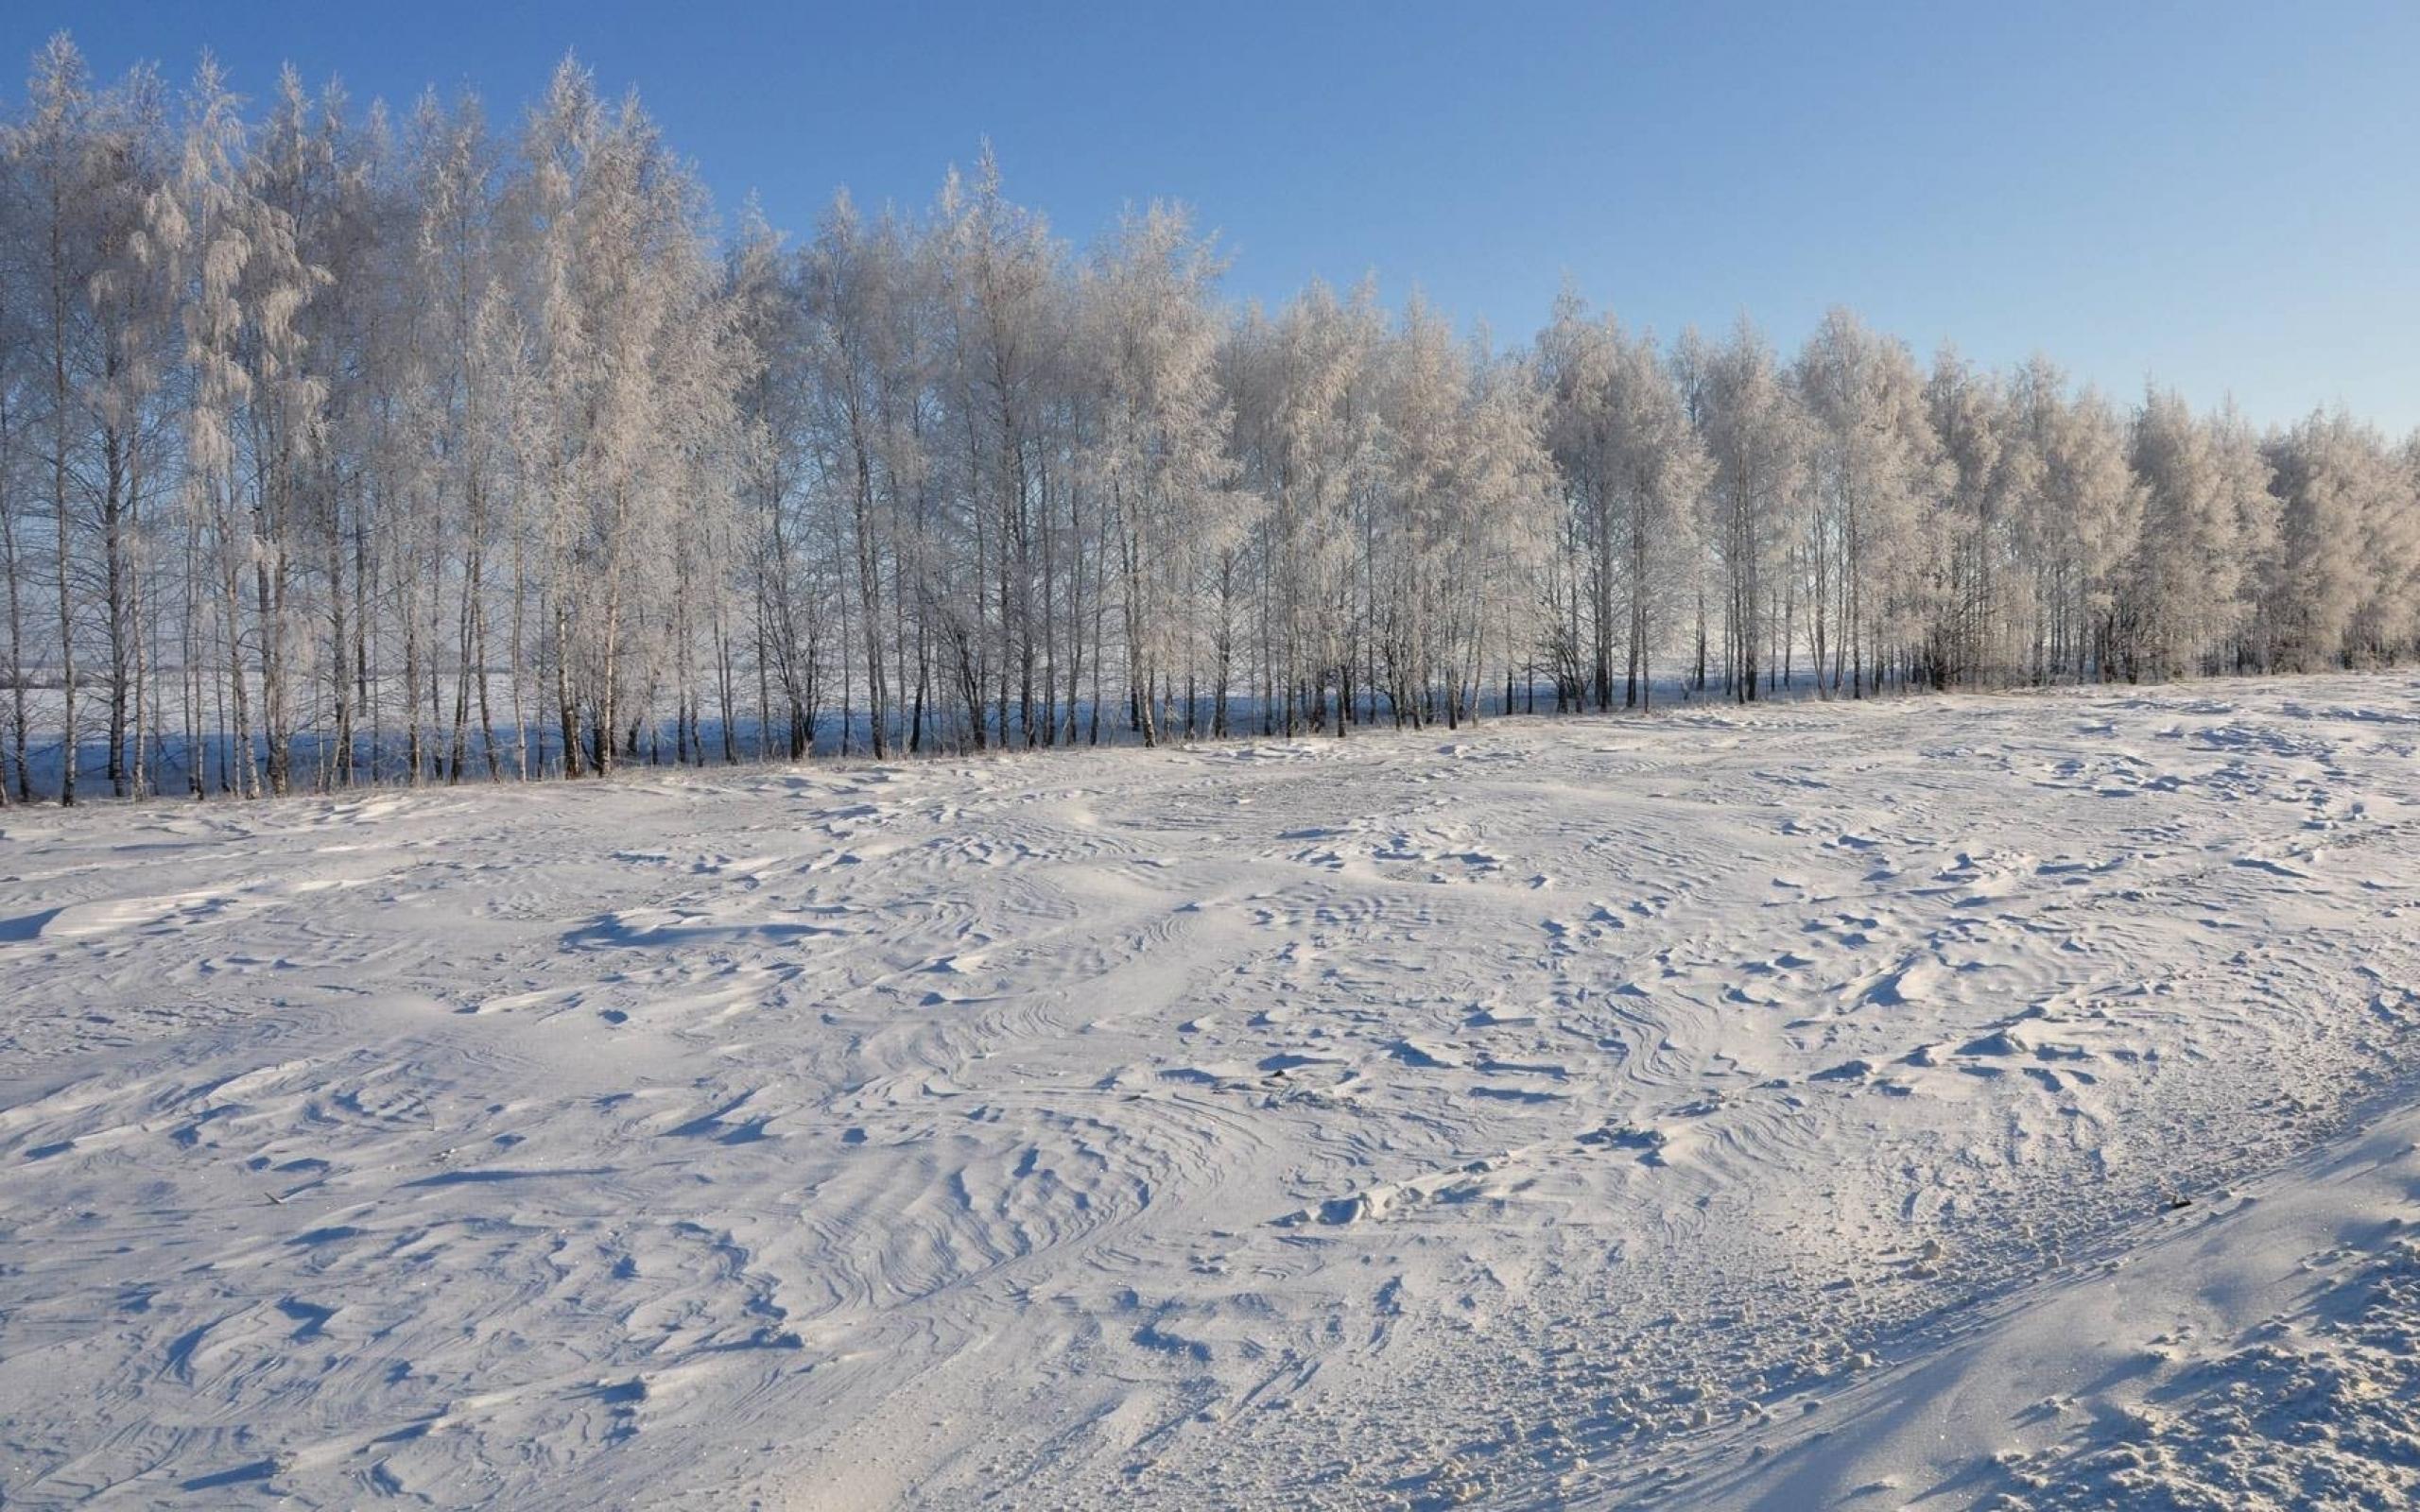 Shirokoformatnye Oboi Zima 2560x1600 Sneg Park Zimnij Les Zimnij